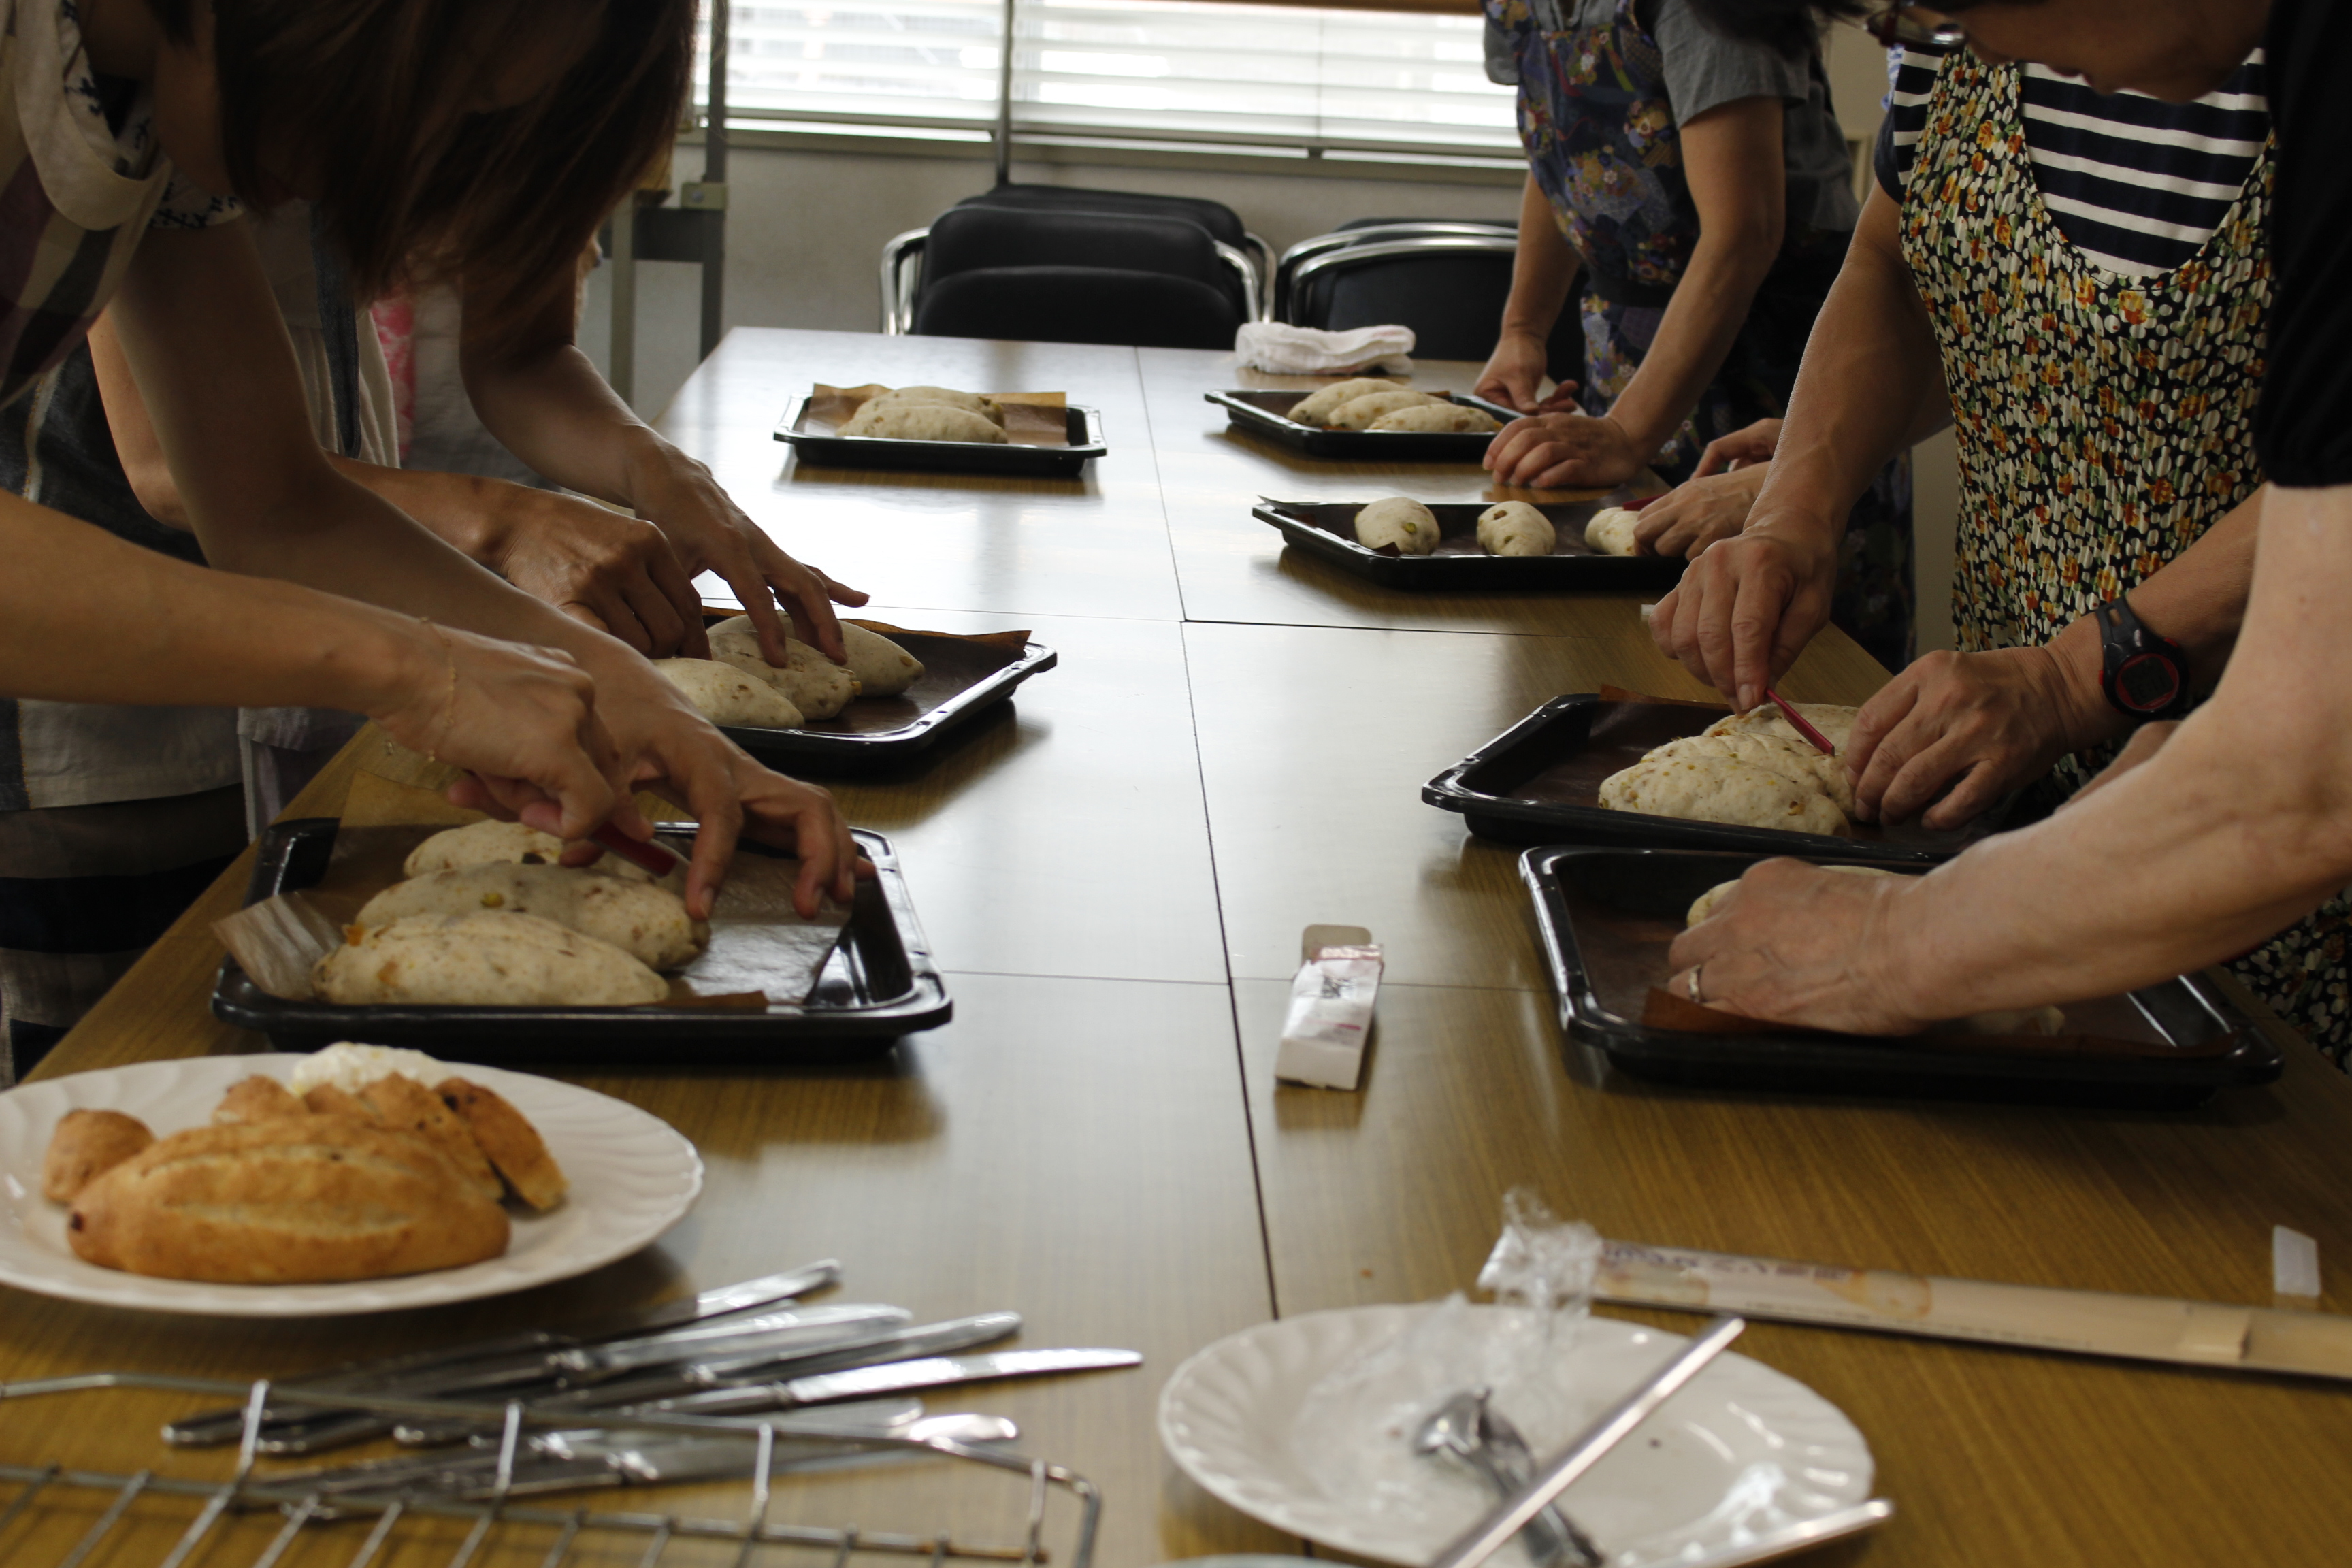 a-ta-sante糖質制限パン料理教室。西田辺。会館でのレッスン『ナッツ&フルーツのライ麦パン』